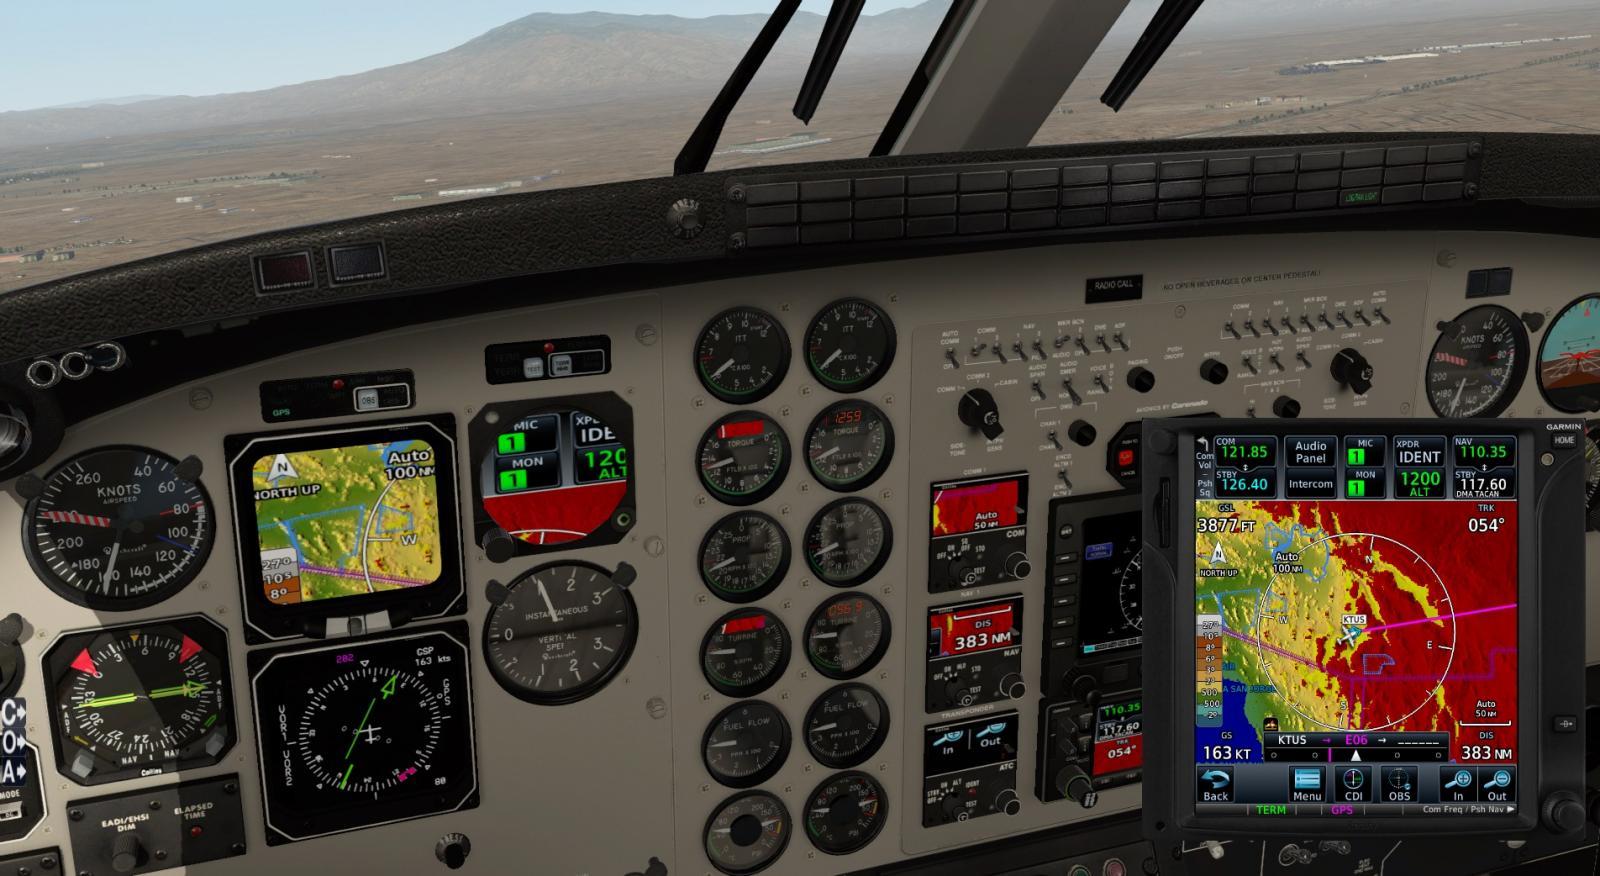 C90 King Air XP11 & GTN750 - Solved - Carenado - Alabeo Support - X